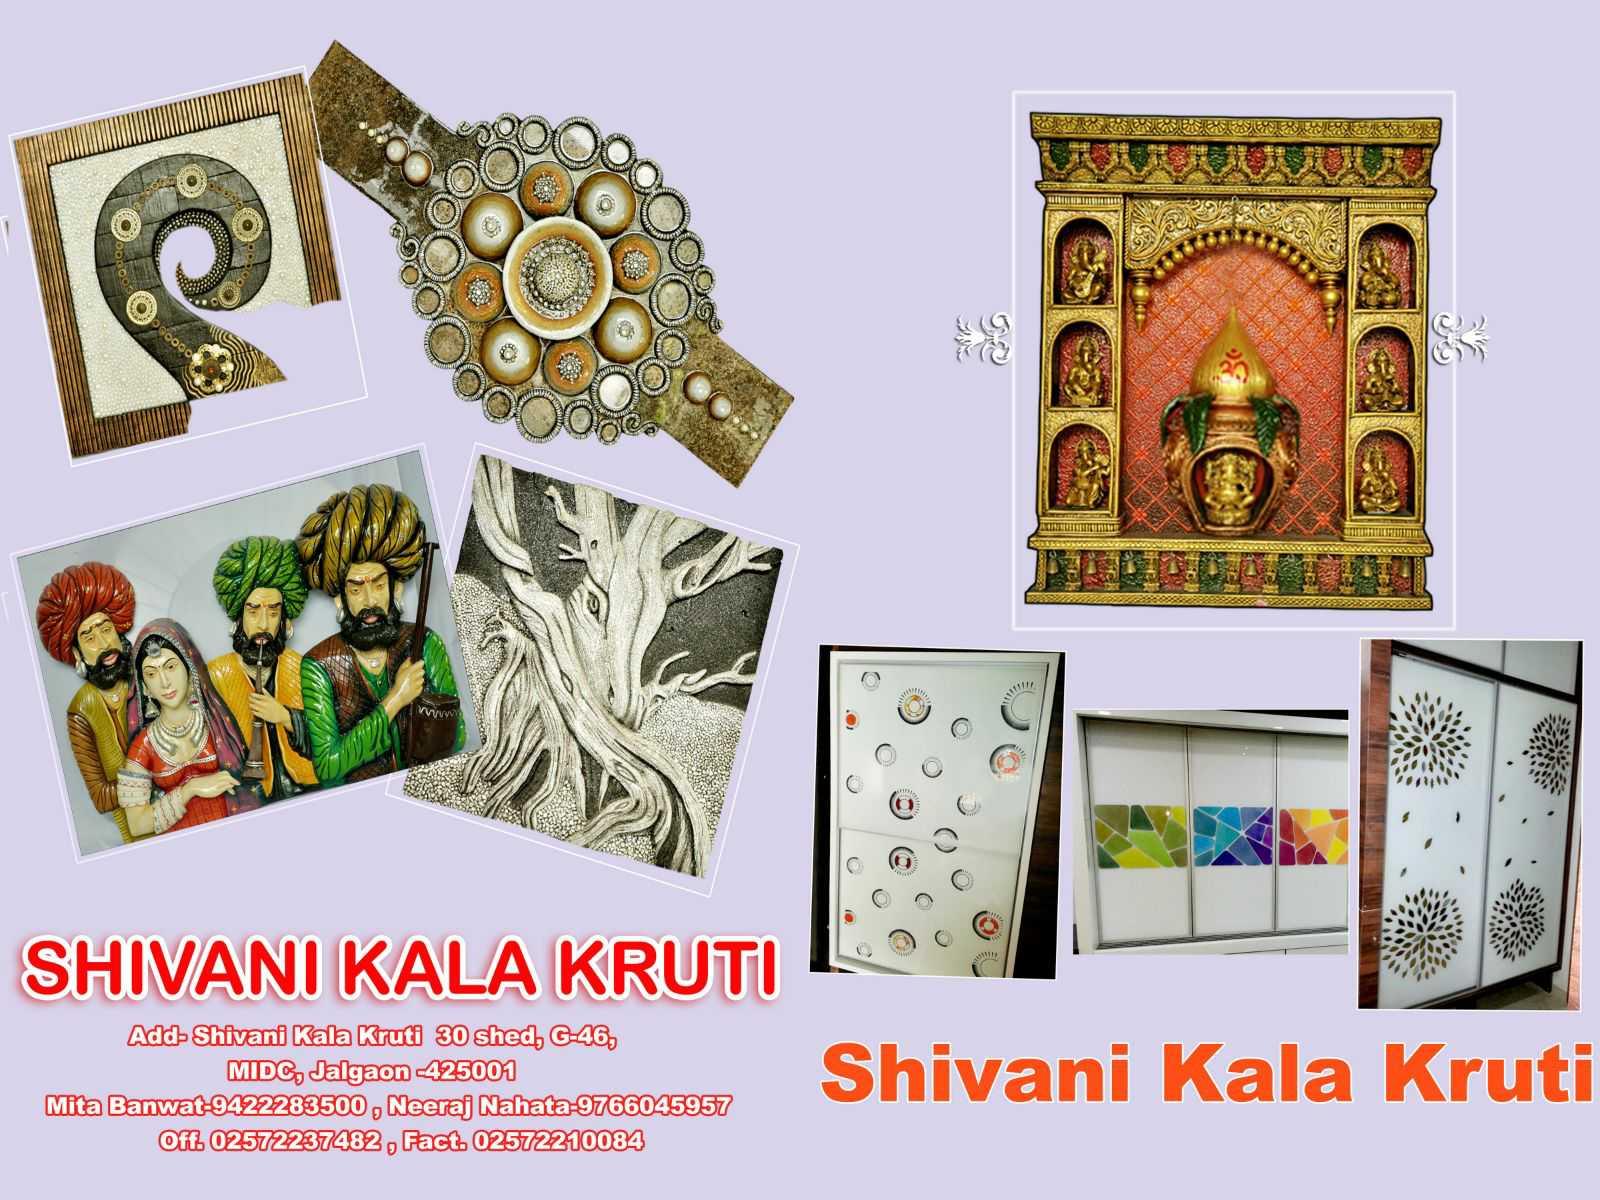 Shivani Kala Kruti